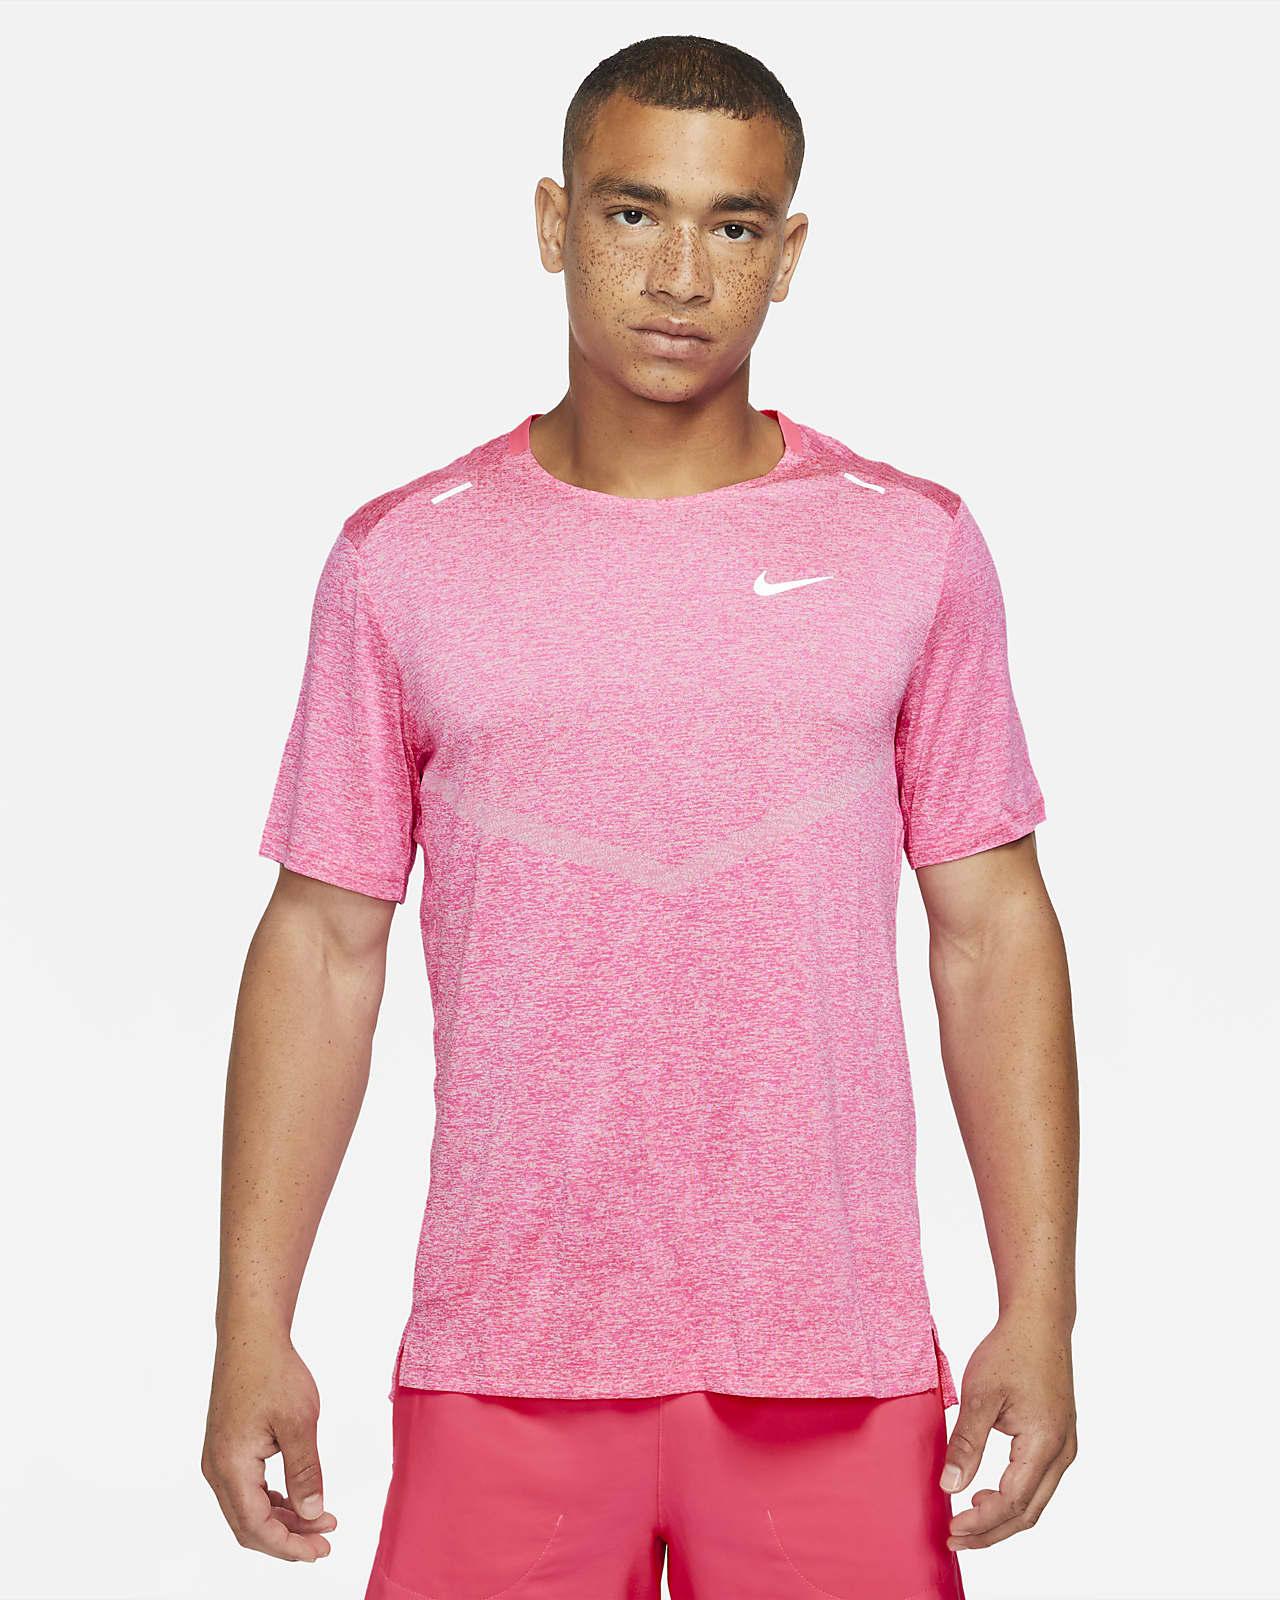 Camiseta de running de manga corta para hombre Nike Dri-FIT Rise 365